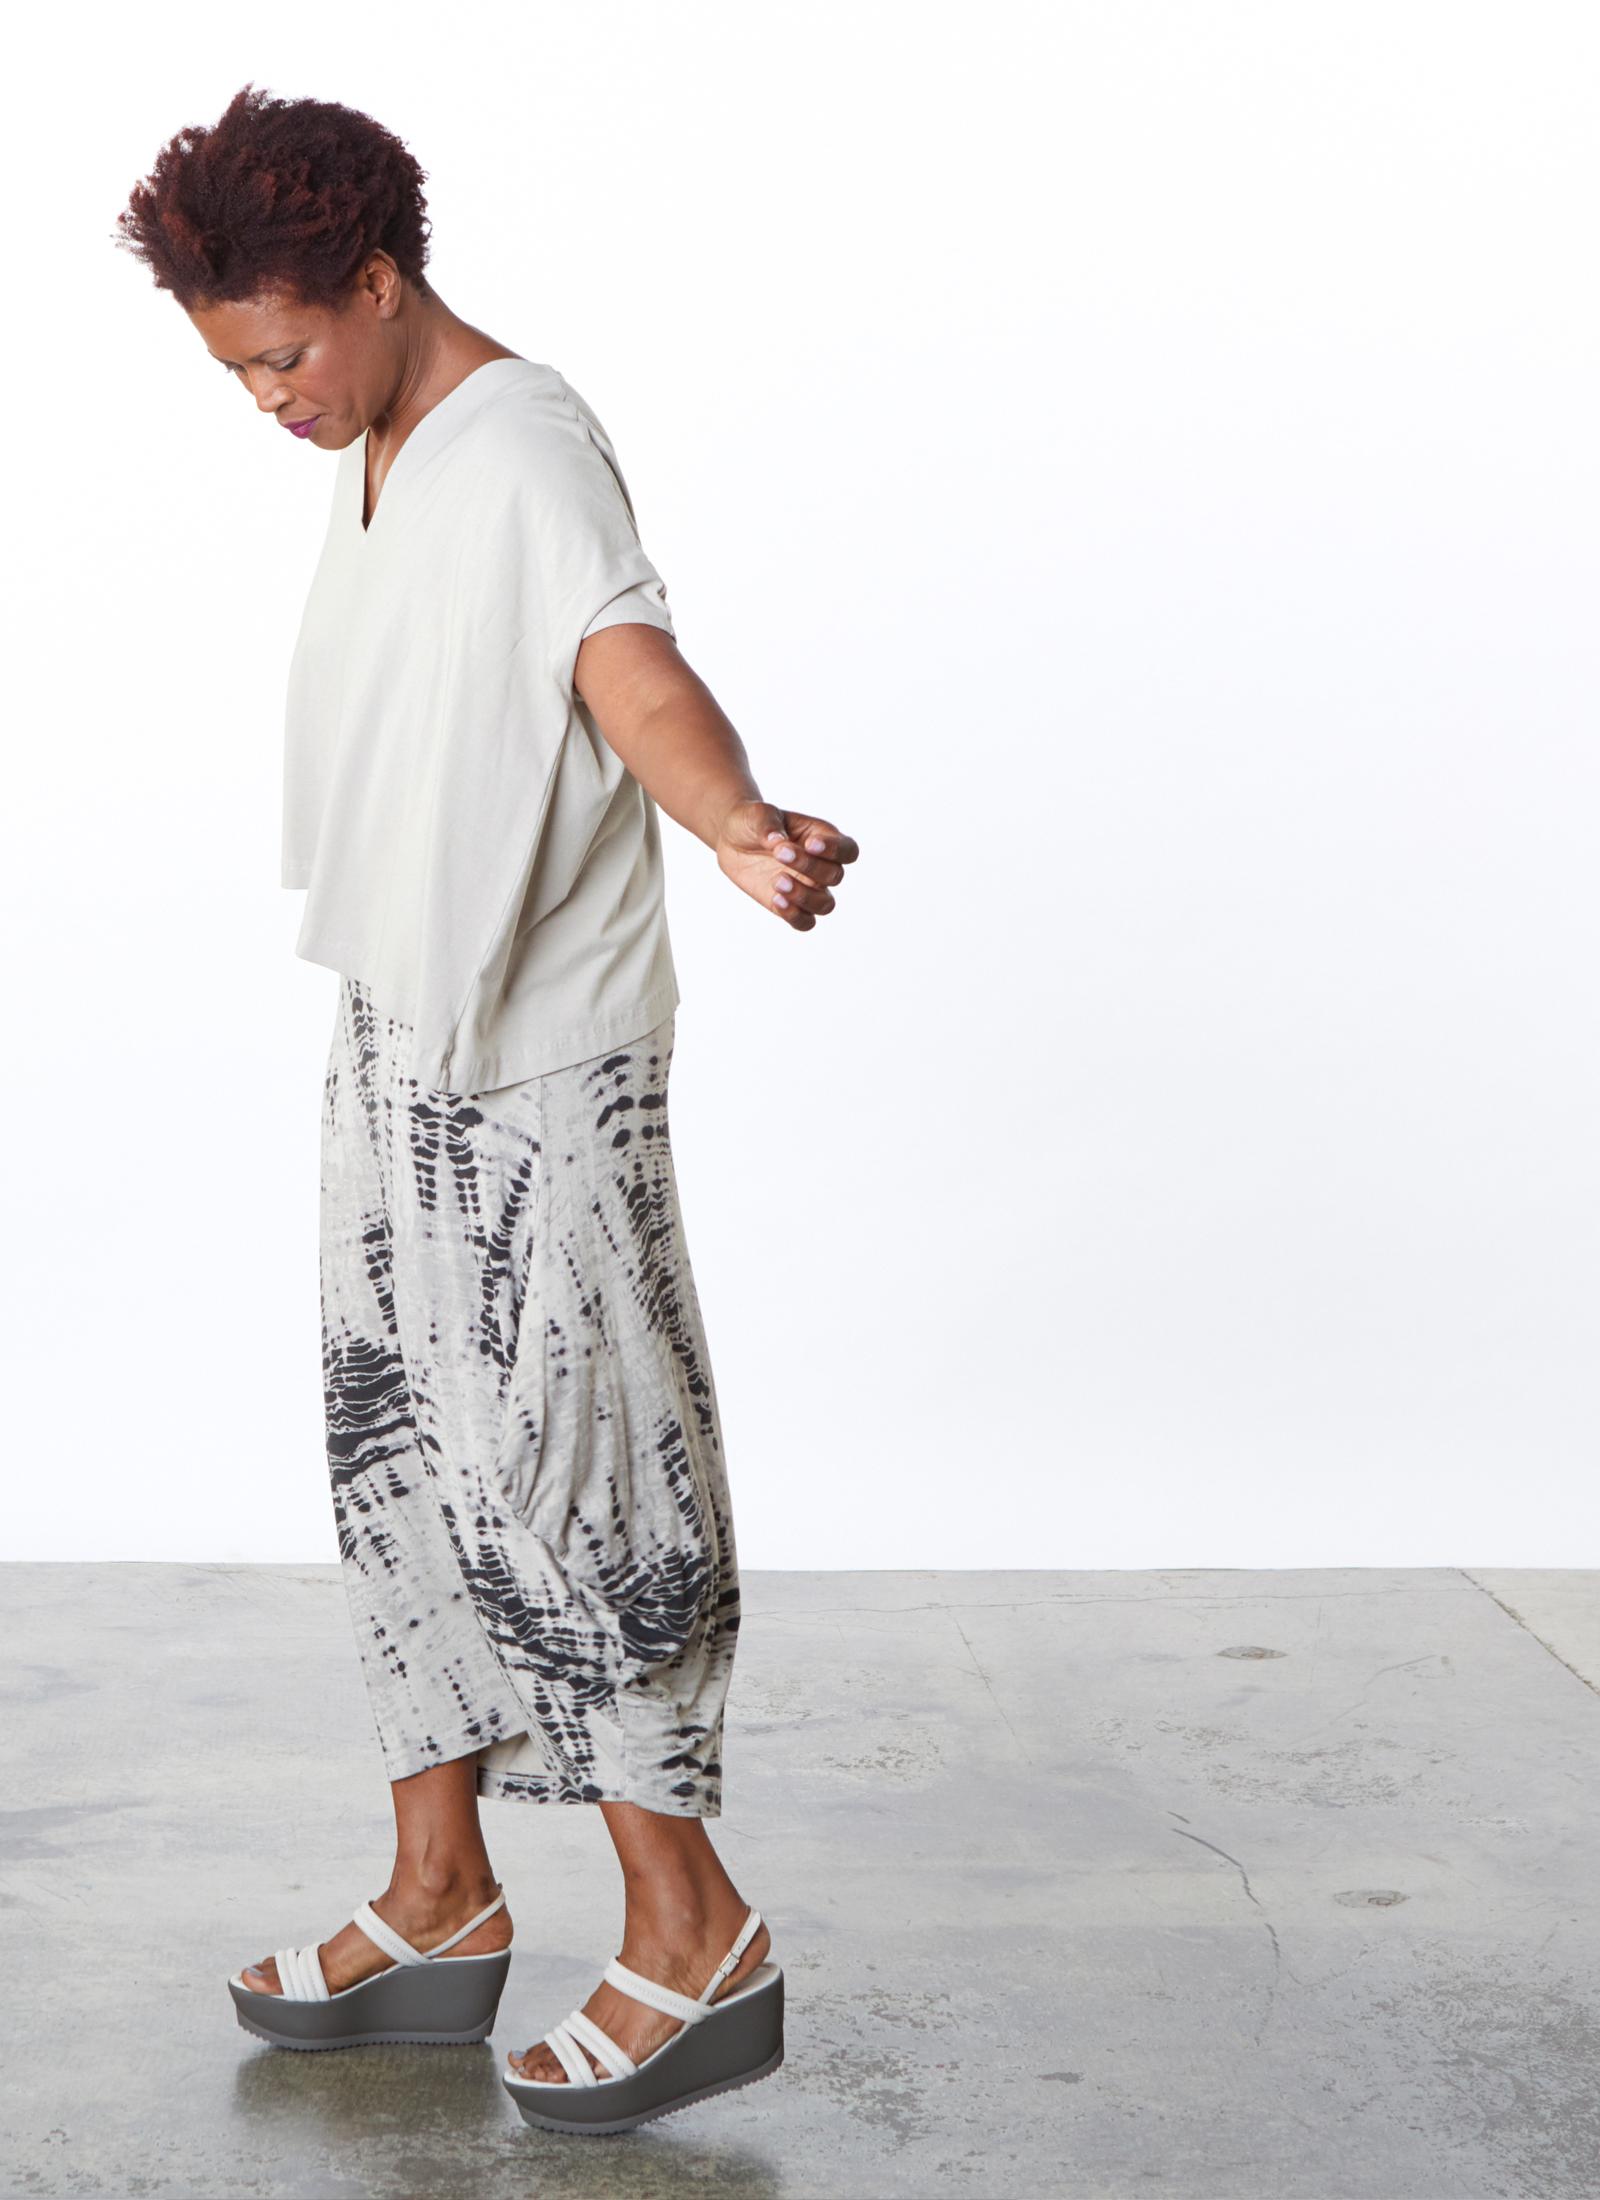 Becca Shirt in Lark Bamboo Cotton, Hamish Skirt in Lark Aguilos Viscose Jersey